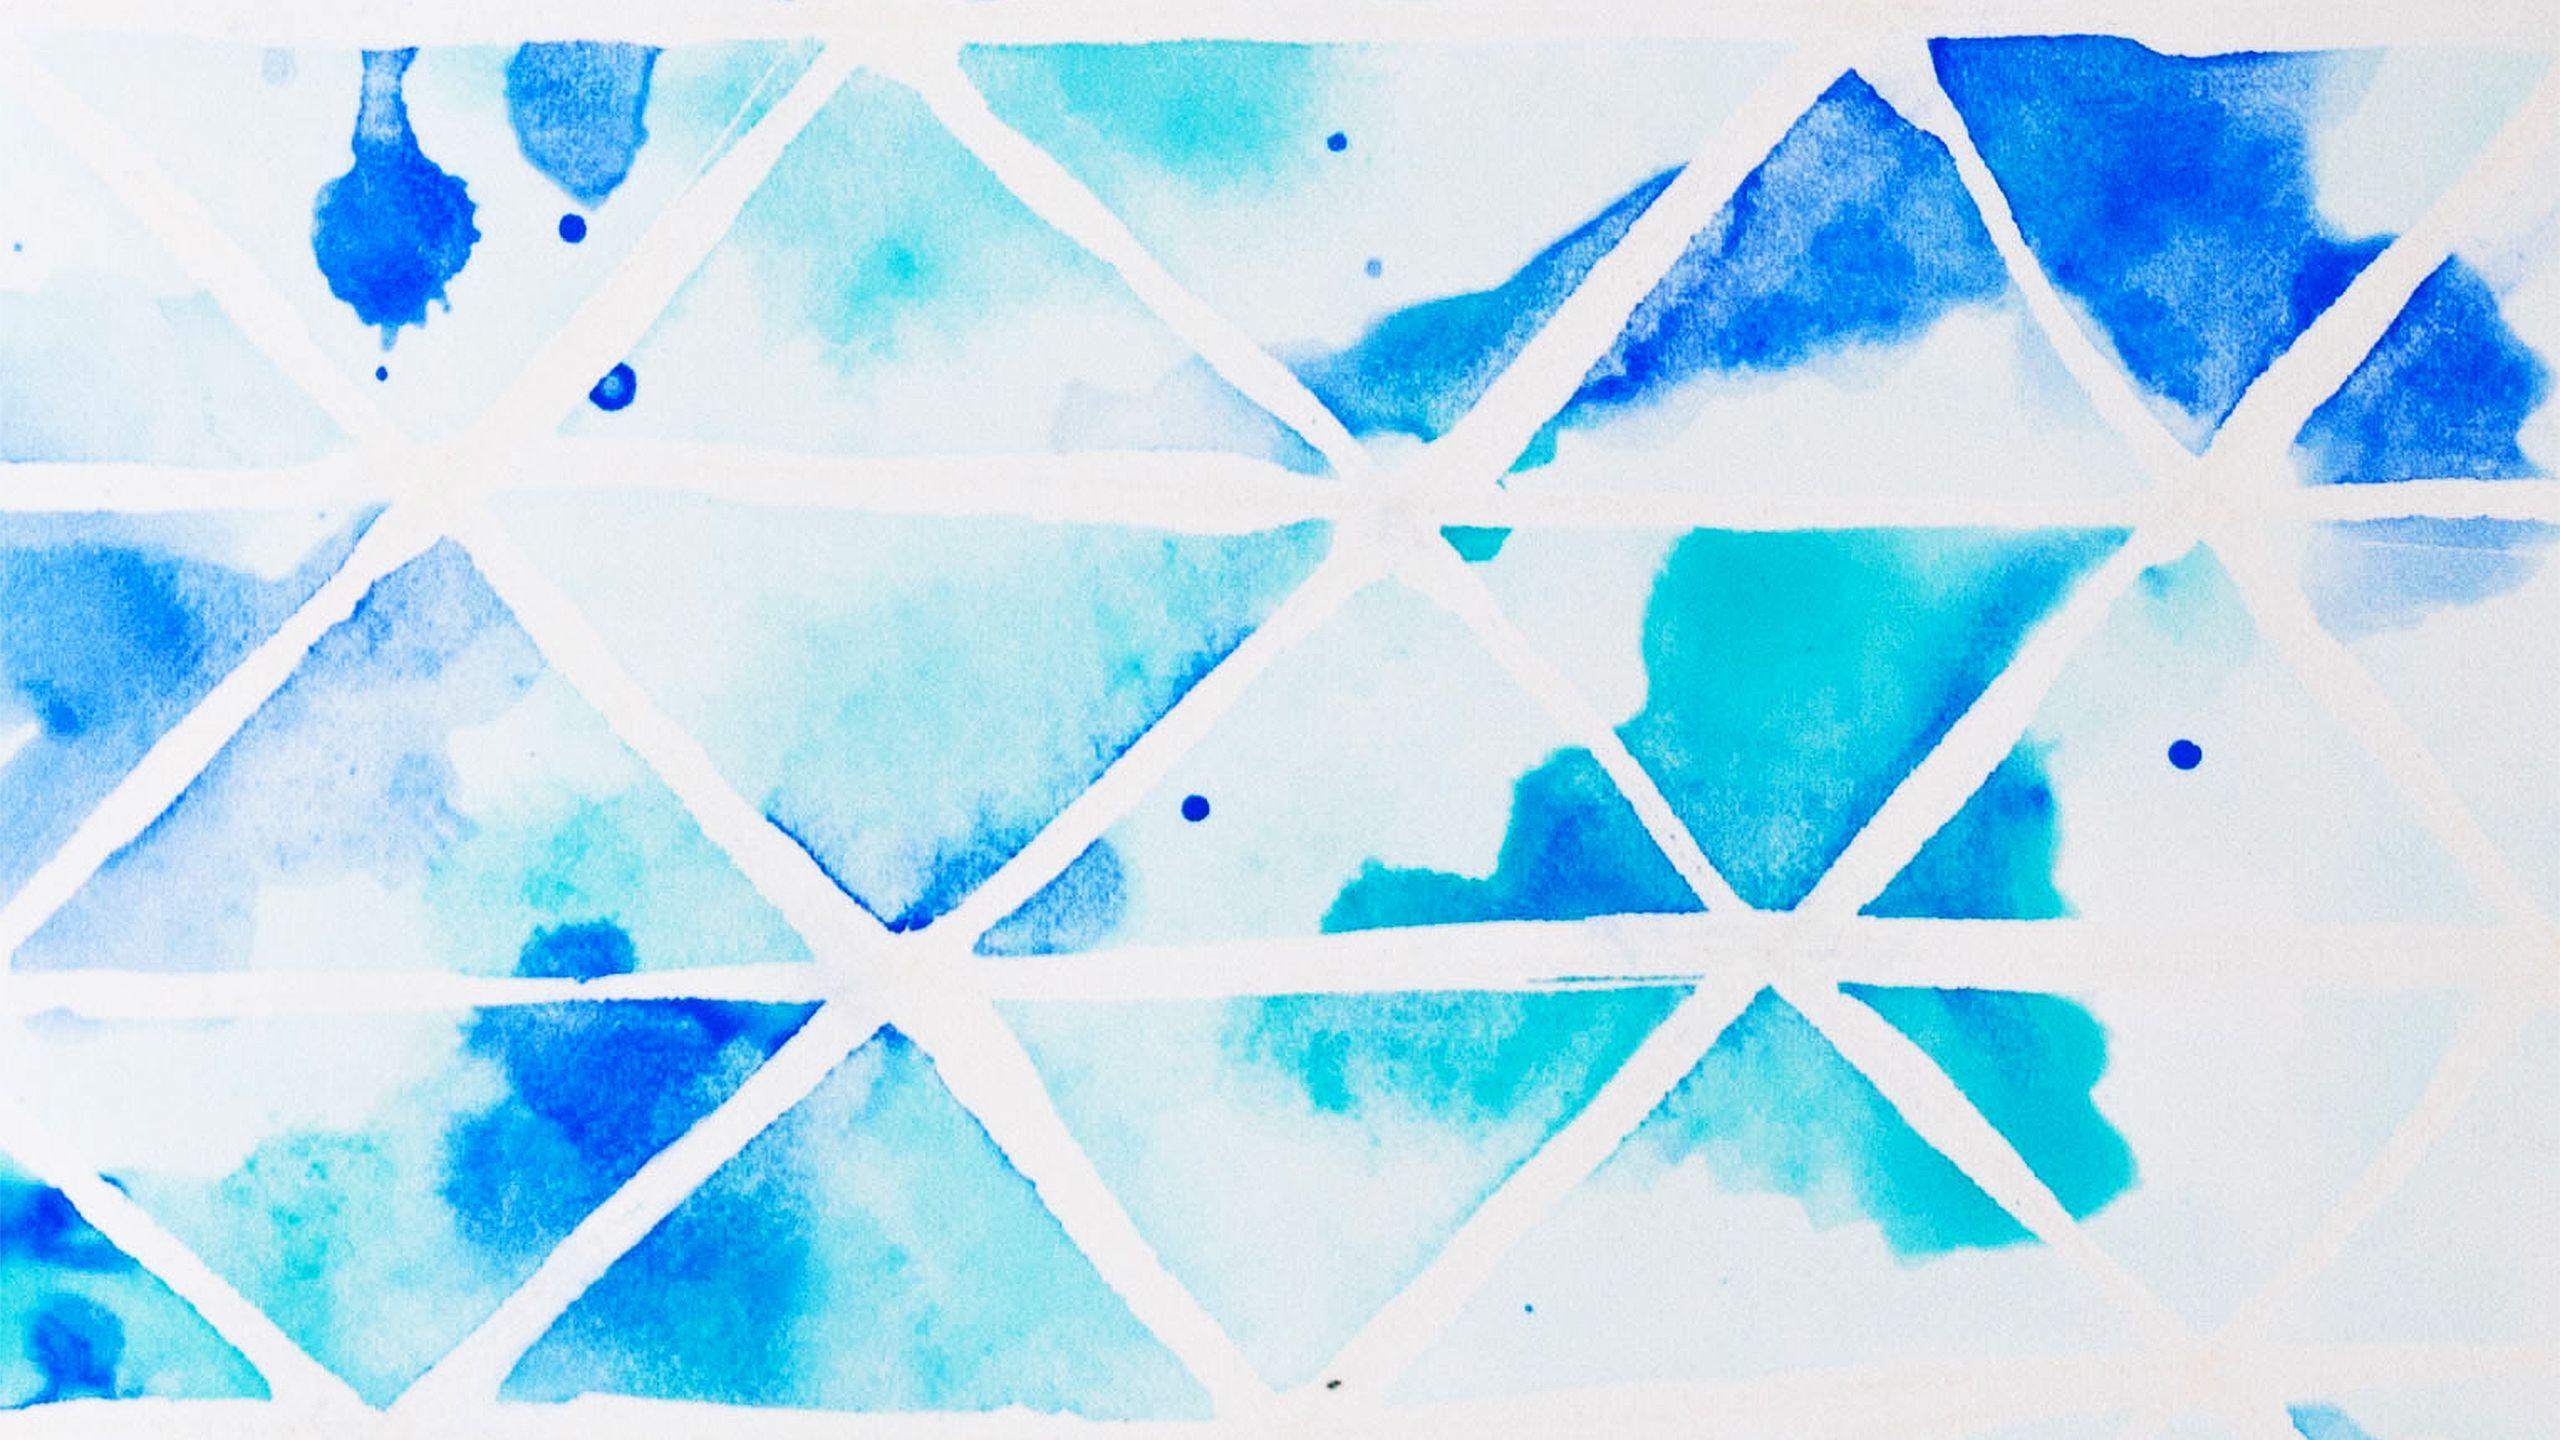 Blue Watercolor Wallpapers Desktop Blue Watercolor Wallpaper Watercolor Wallpaper Watercolor Background